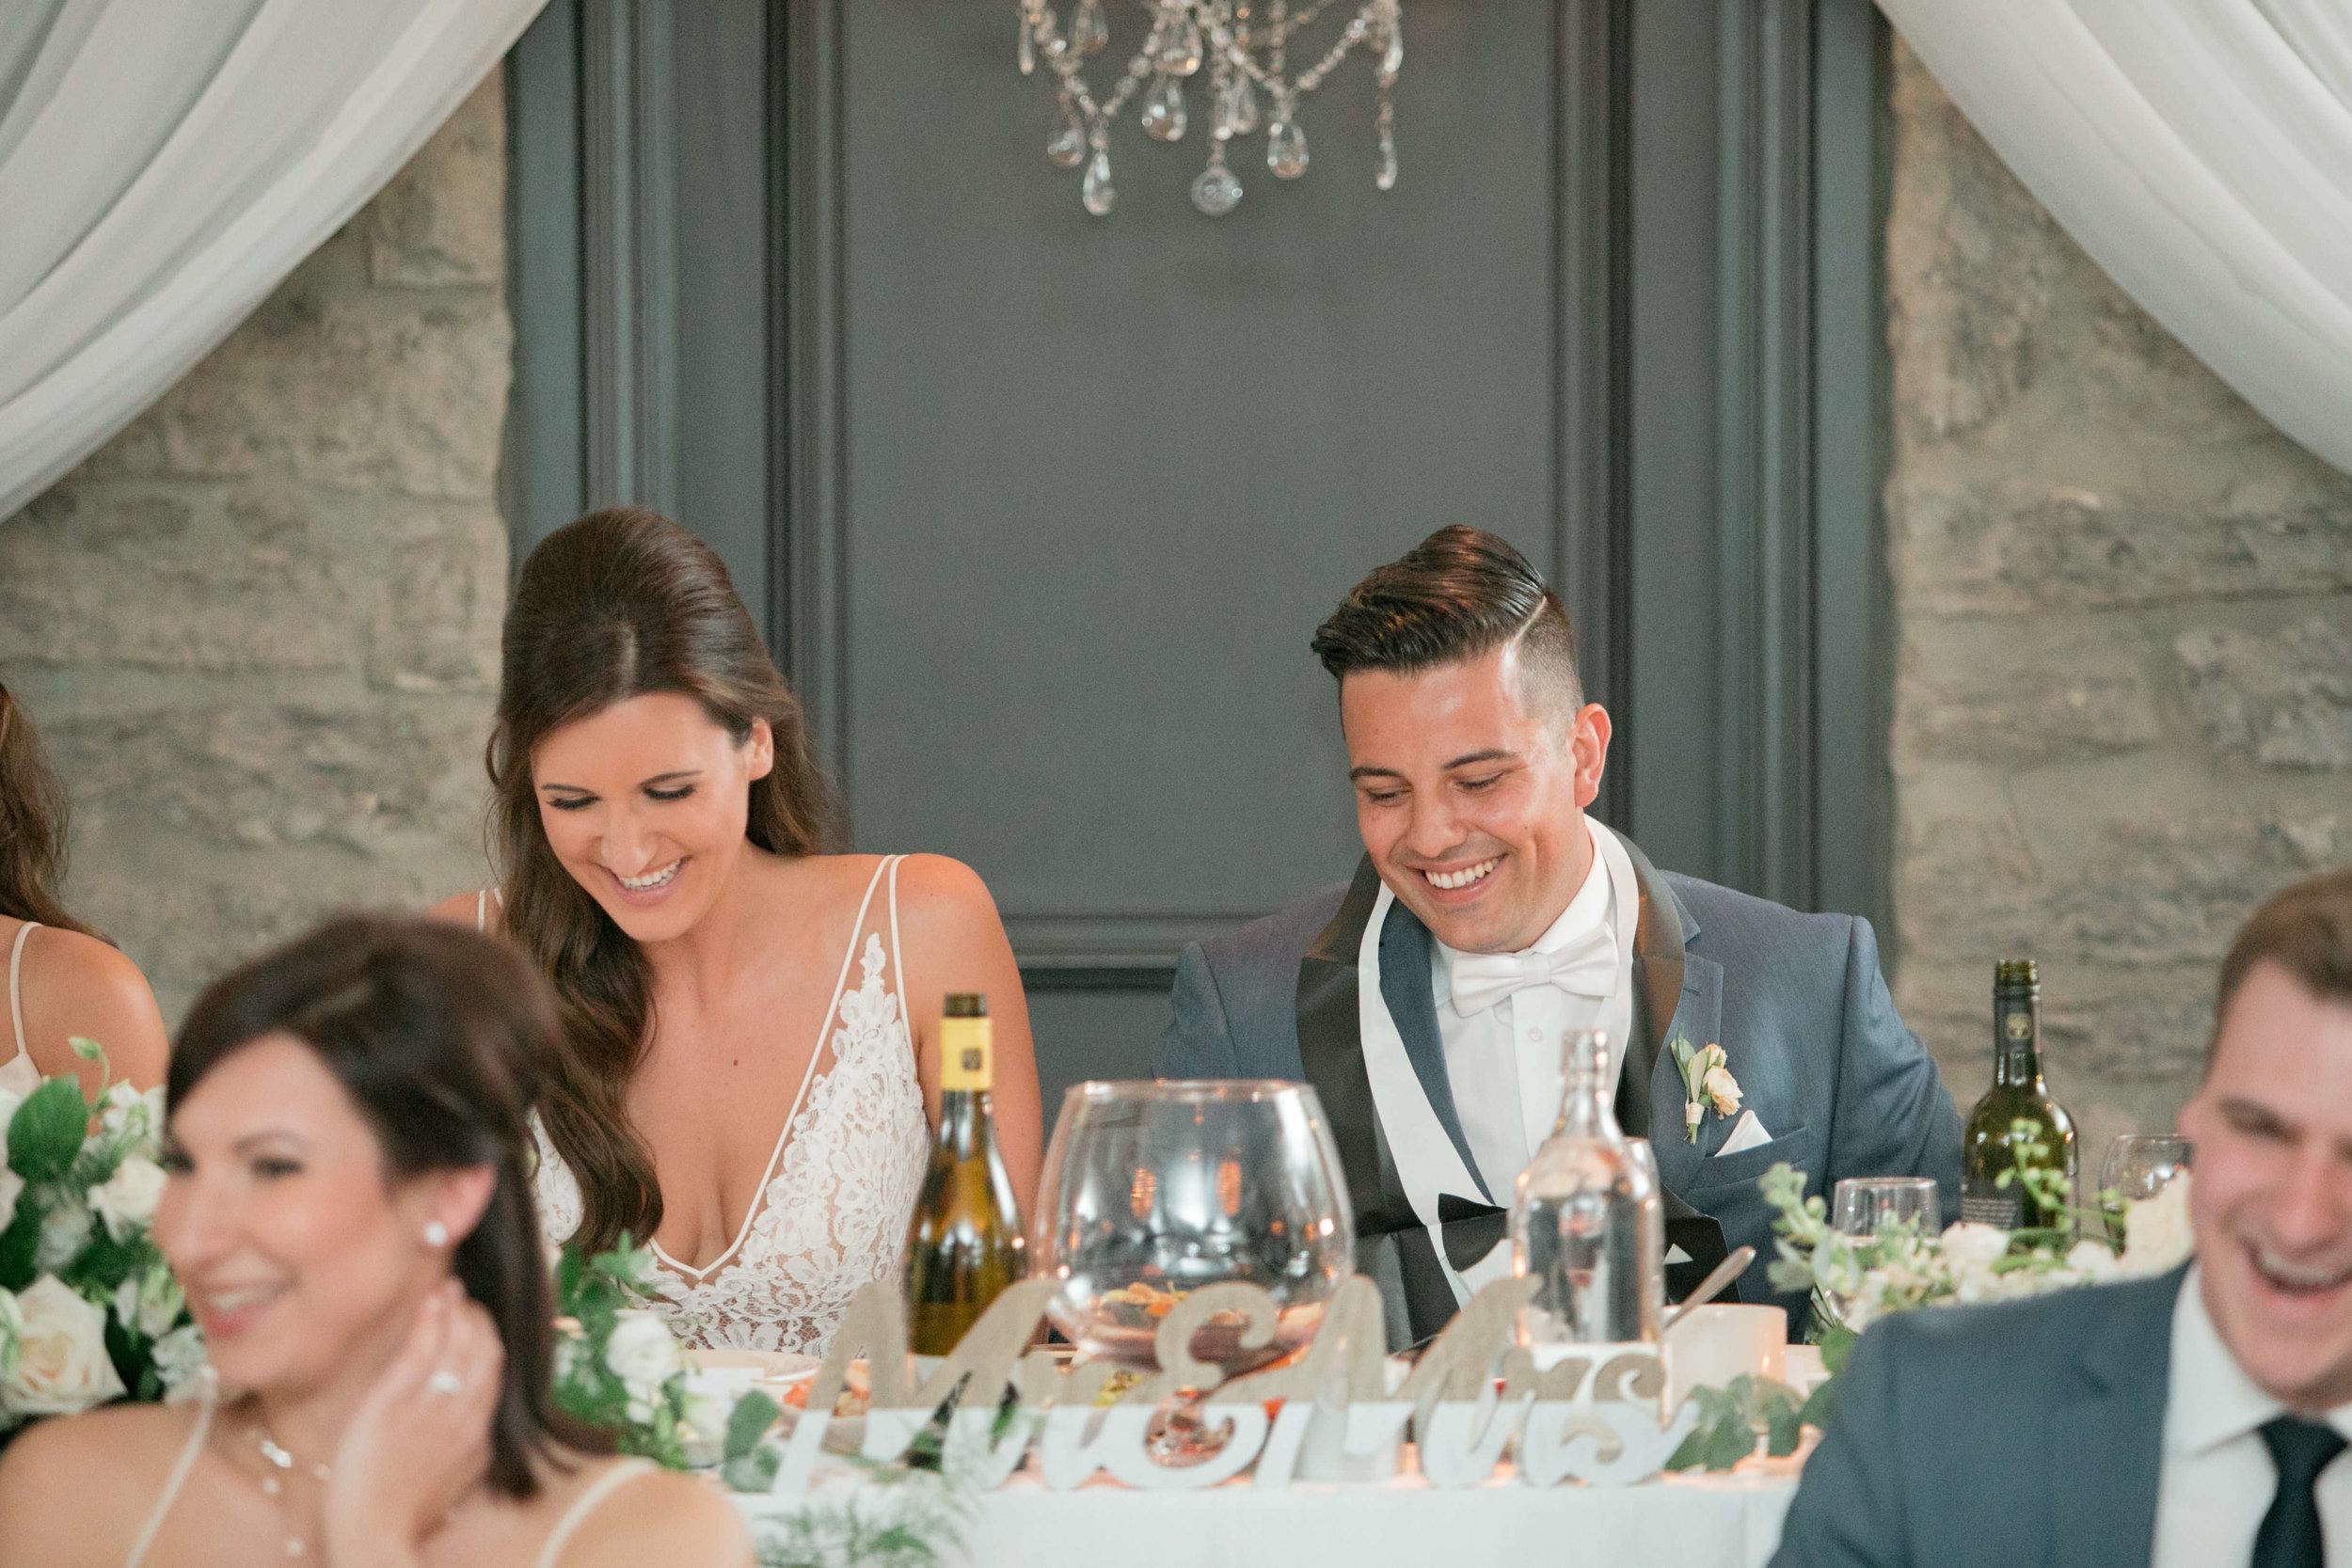 Miranda___Daniel___Daniel_Ricci_Weddings___High_Res._Finals_551.jpg